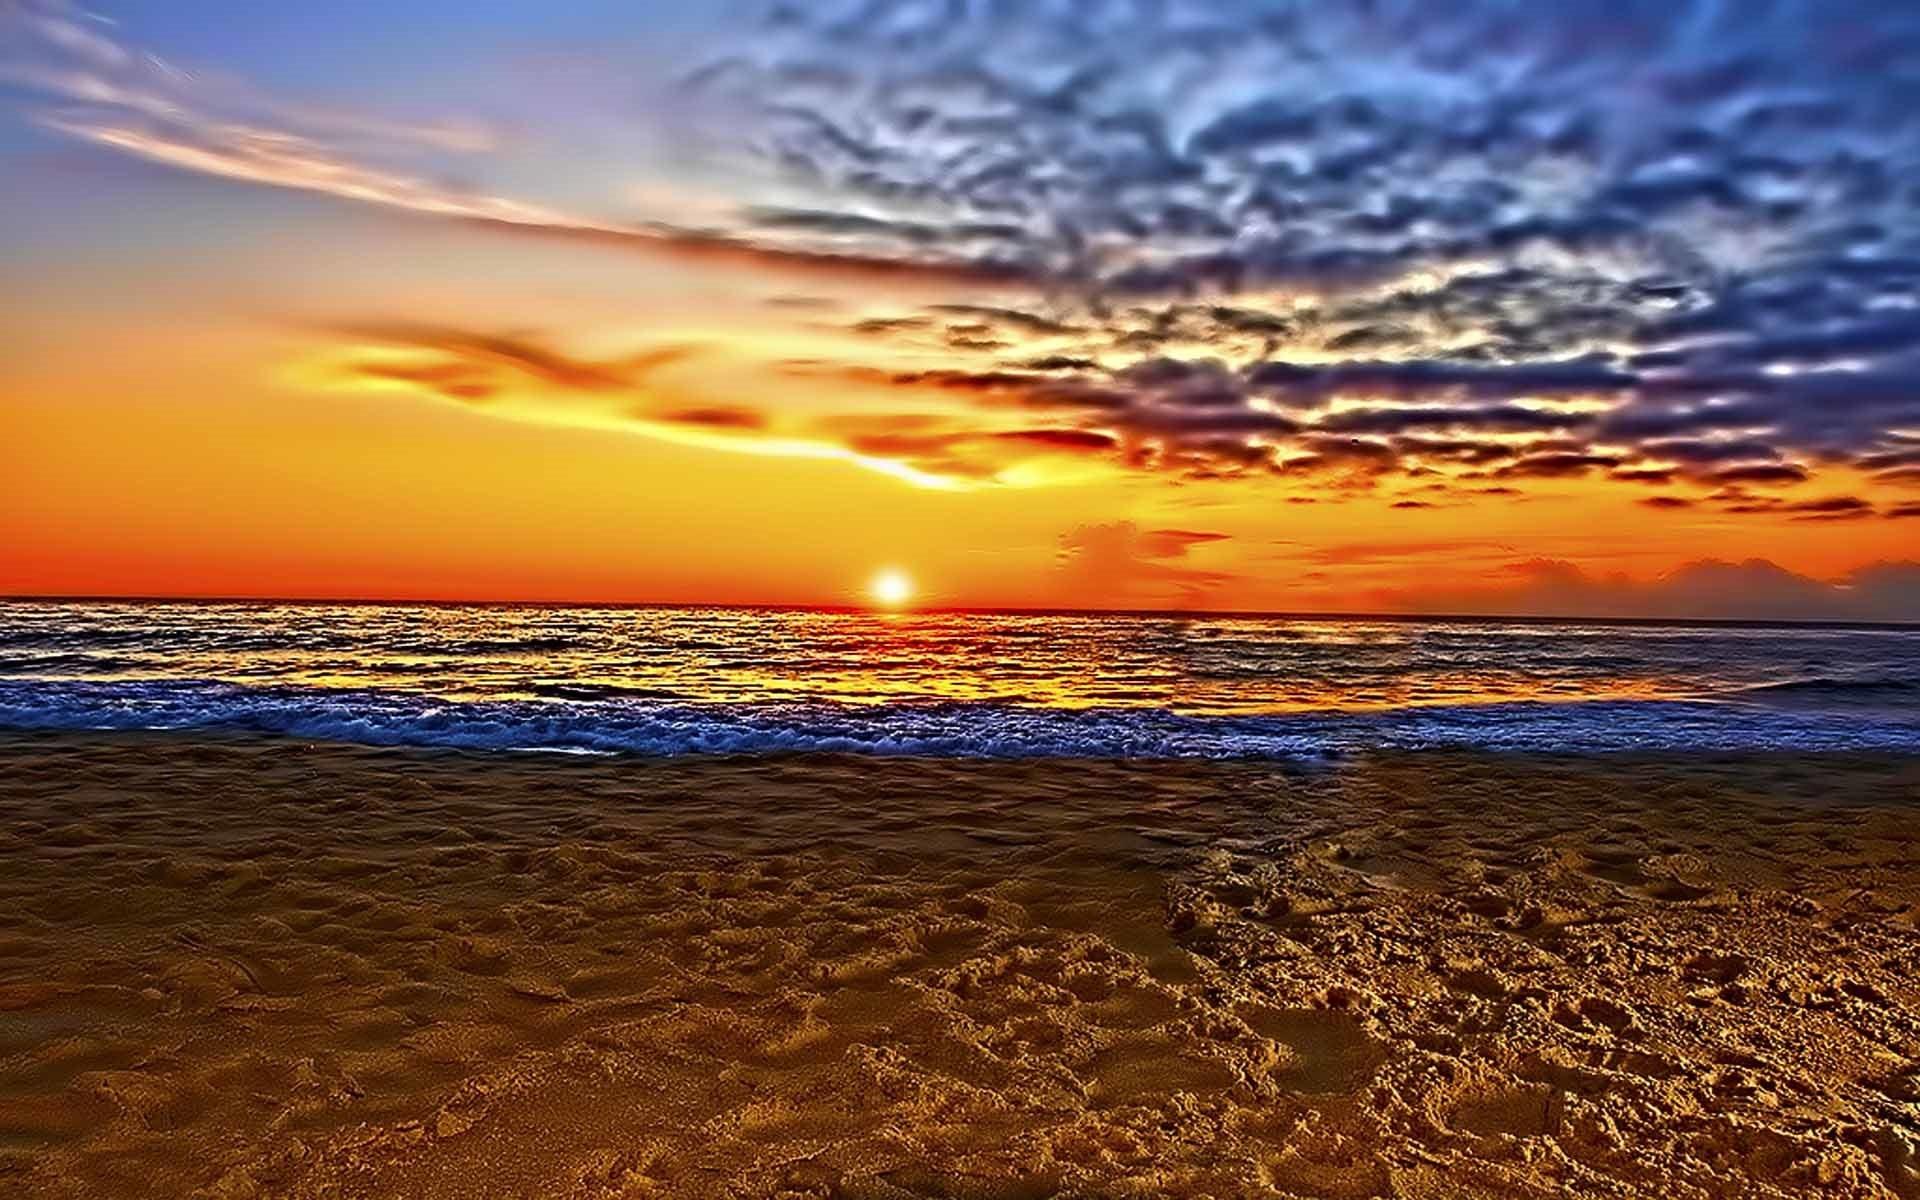 Fall Hd Wallpapers 1080p Widescreen Beautiful Beach Sunset Wallpaper 61 Images